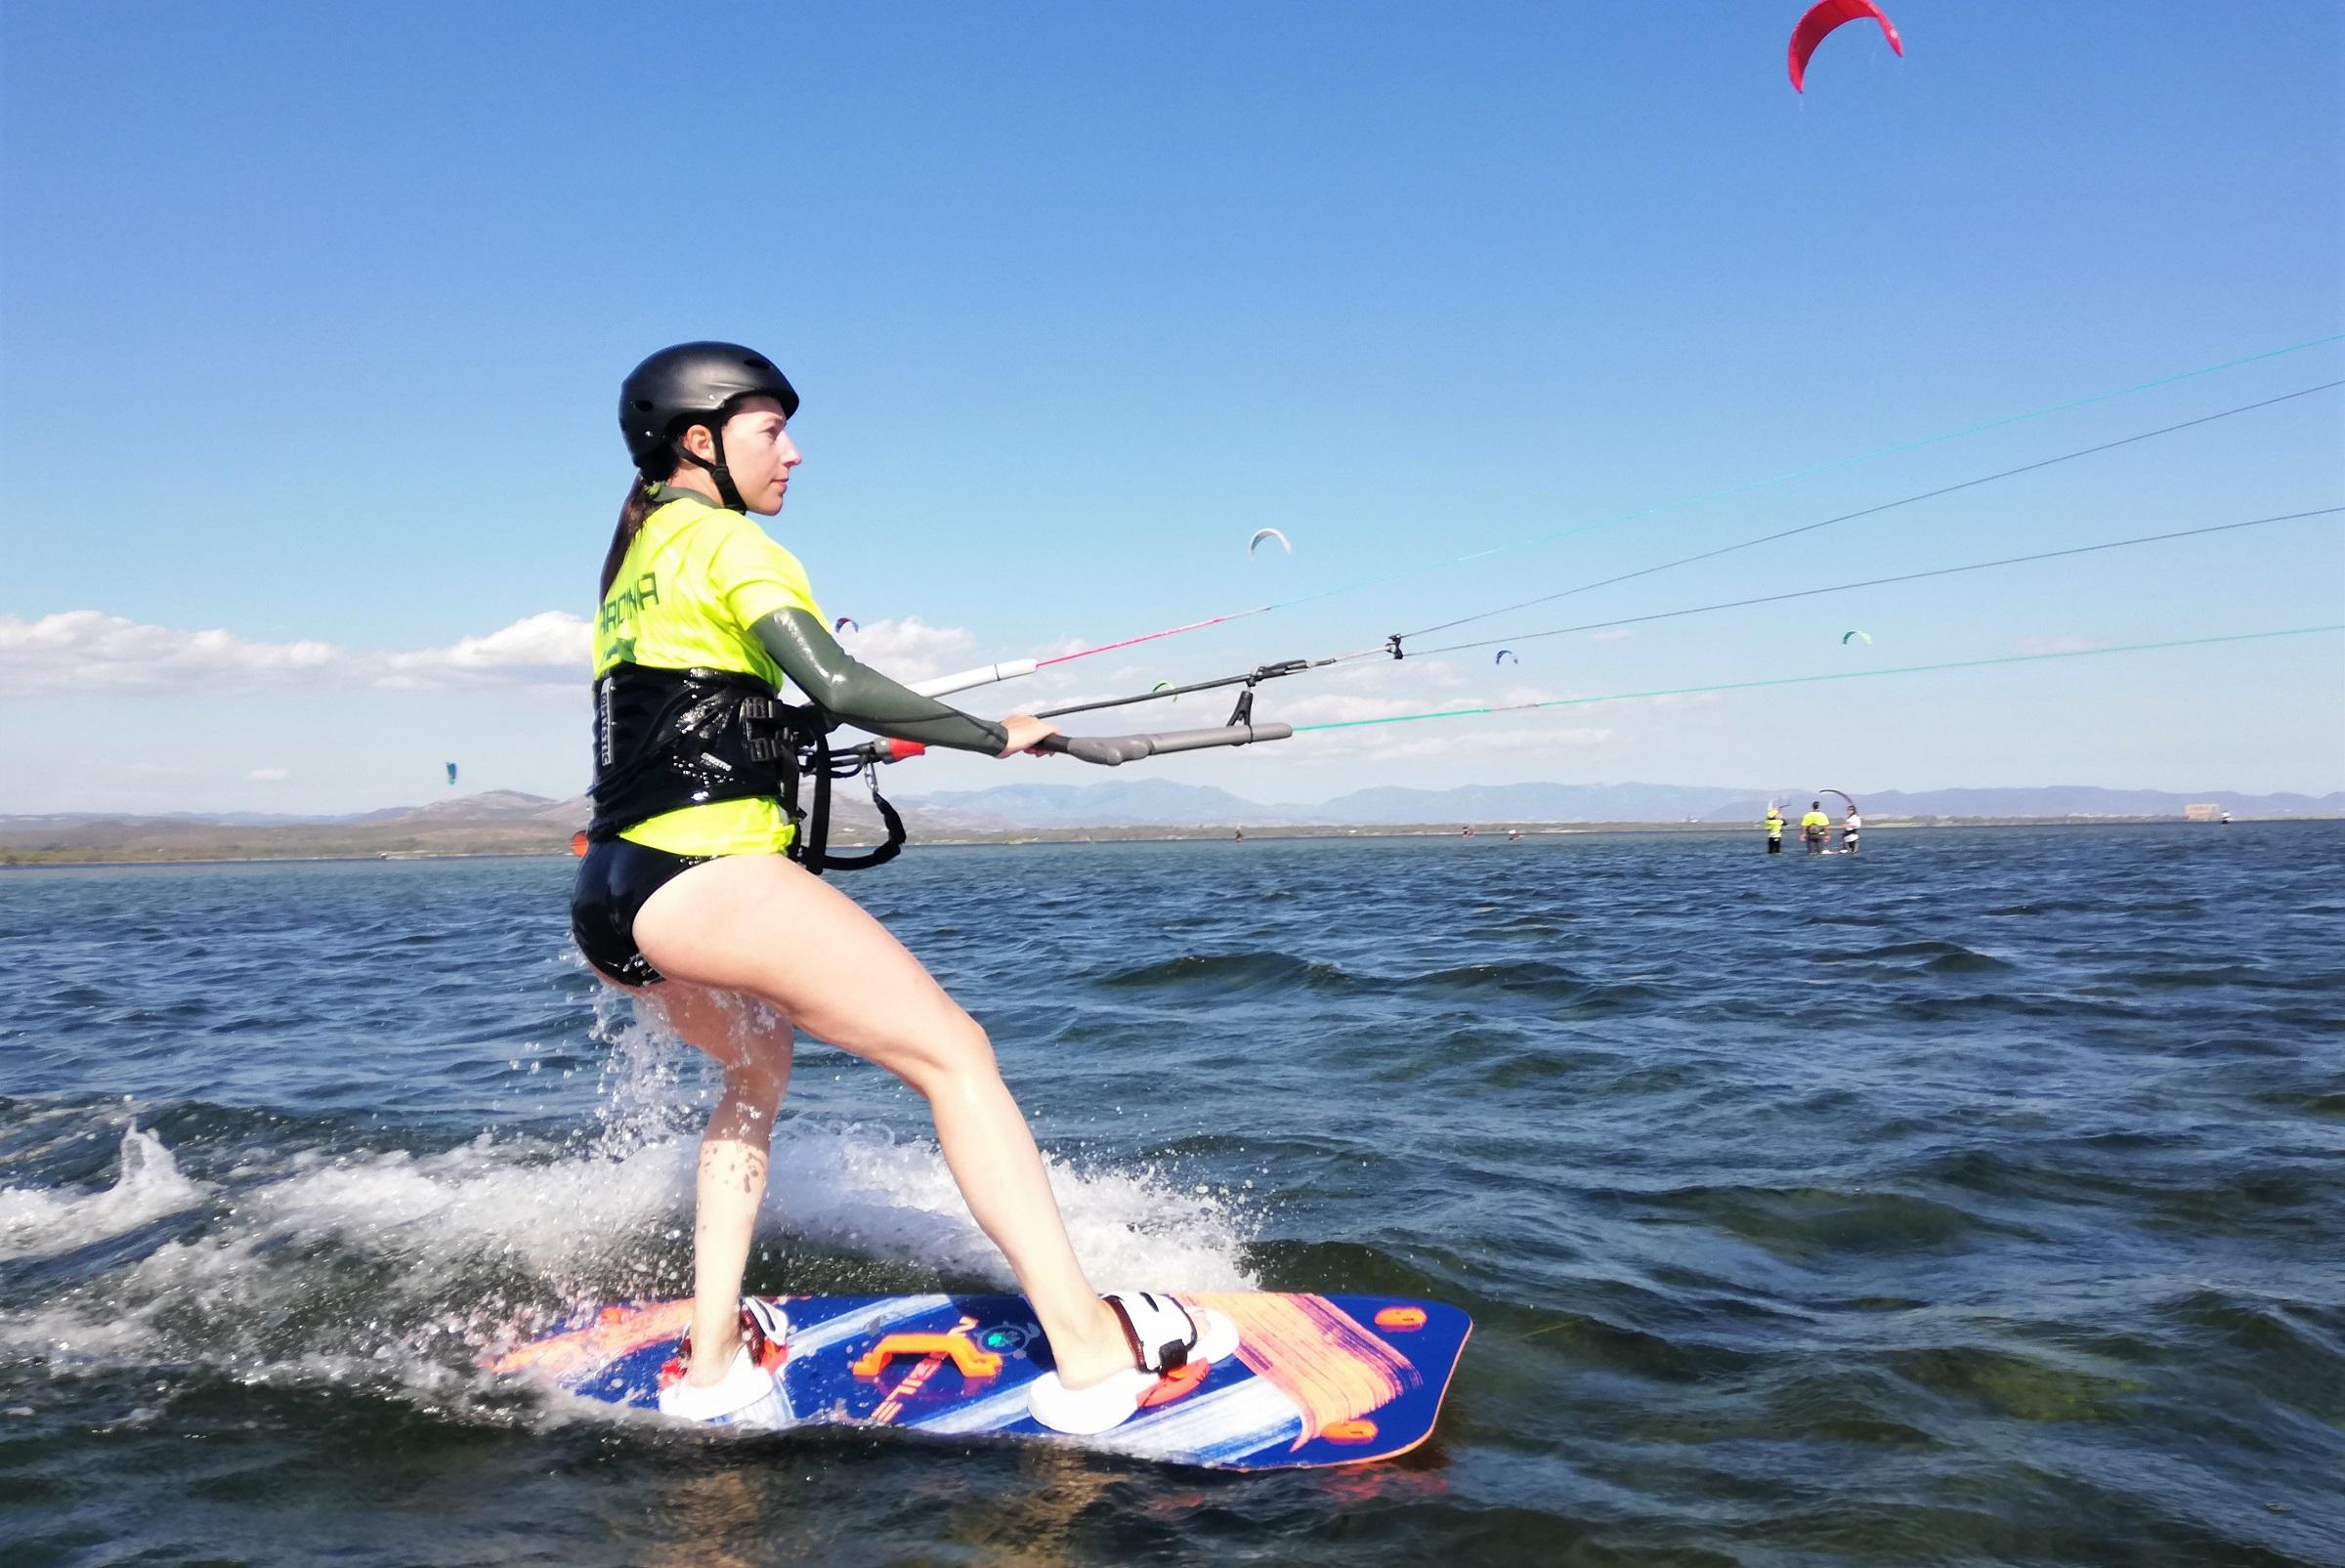 imparare il kitesurf a Punta Trettu il miglior kite spot della Sardegna